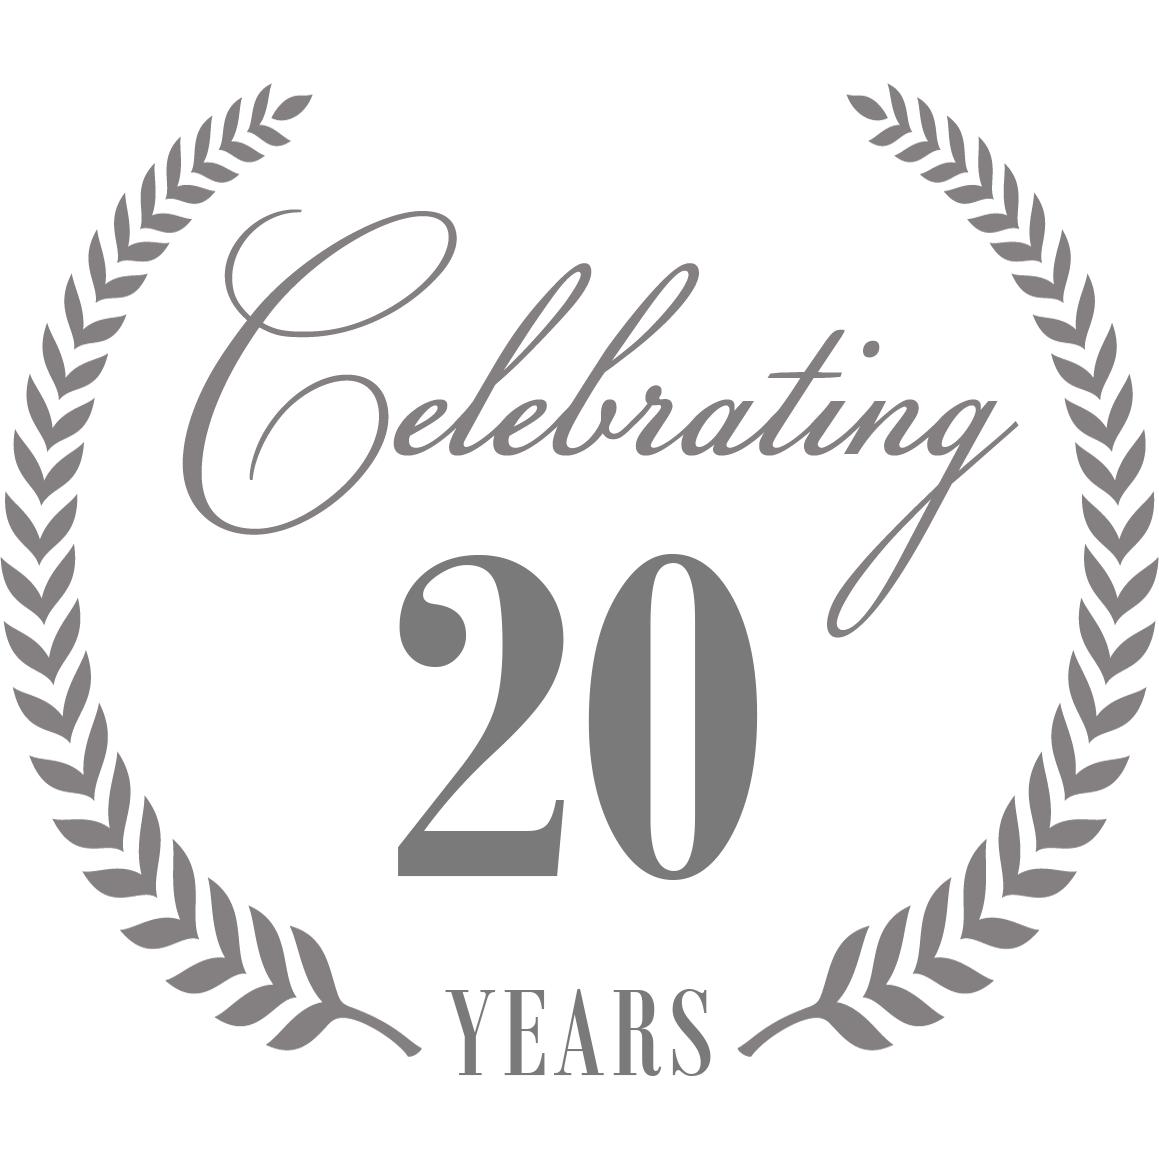 Foundry Art Celebrating 20 Years